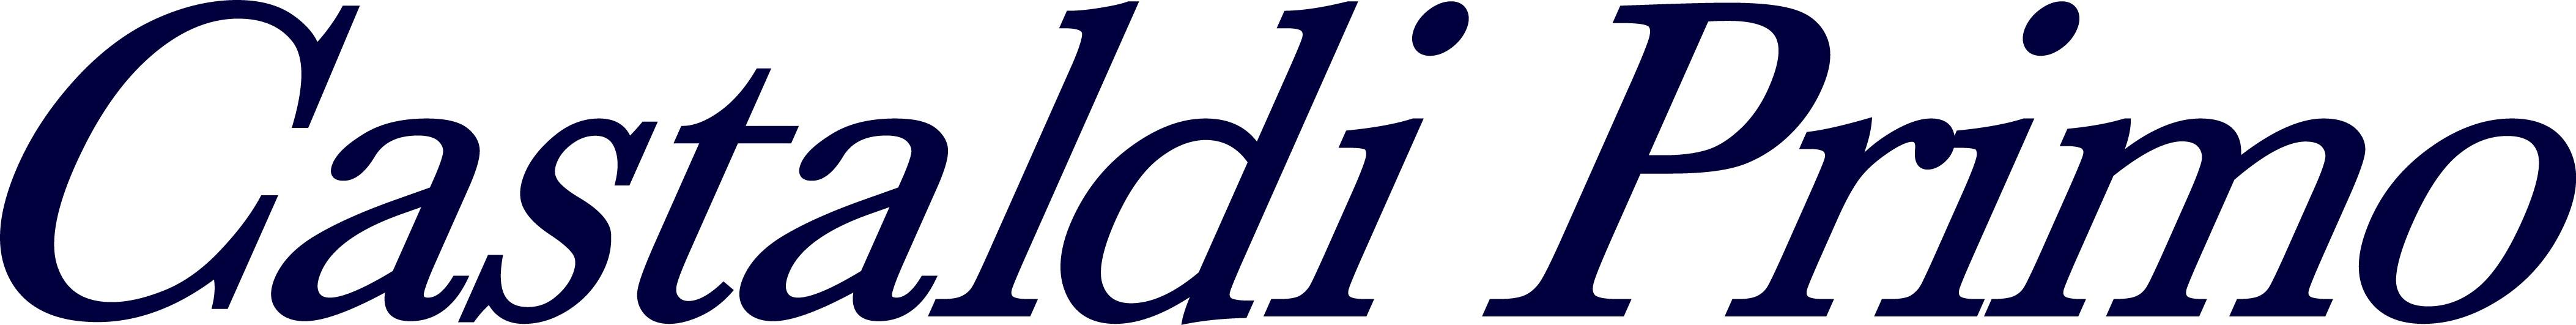 Castaldi Primo srl logo